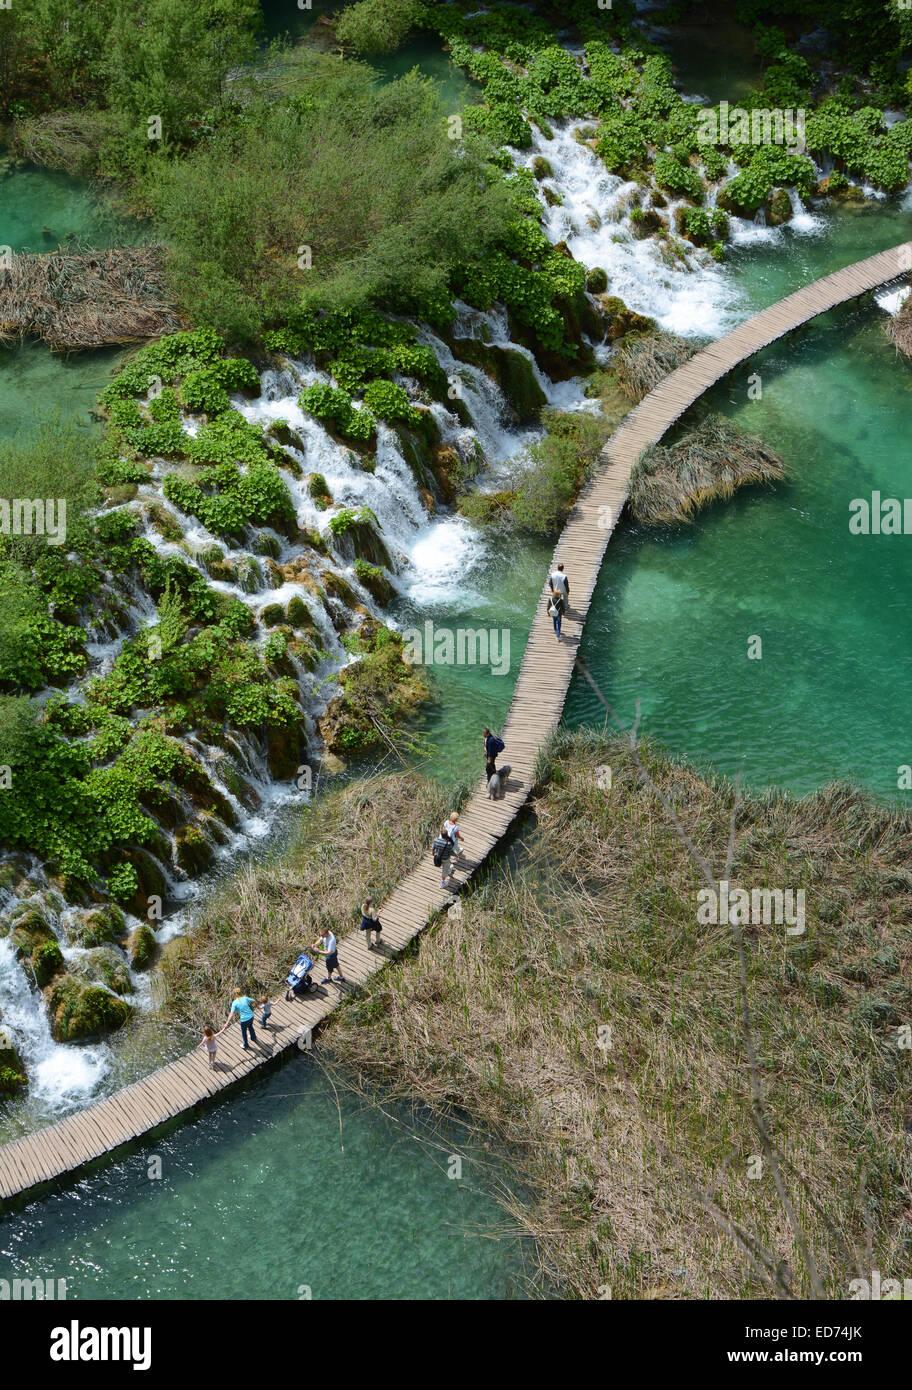 Plitvice lakes, Croatia - Stock Image